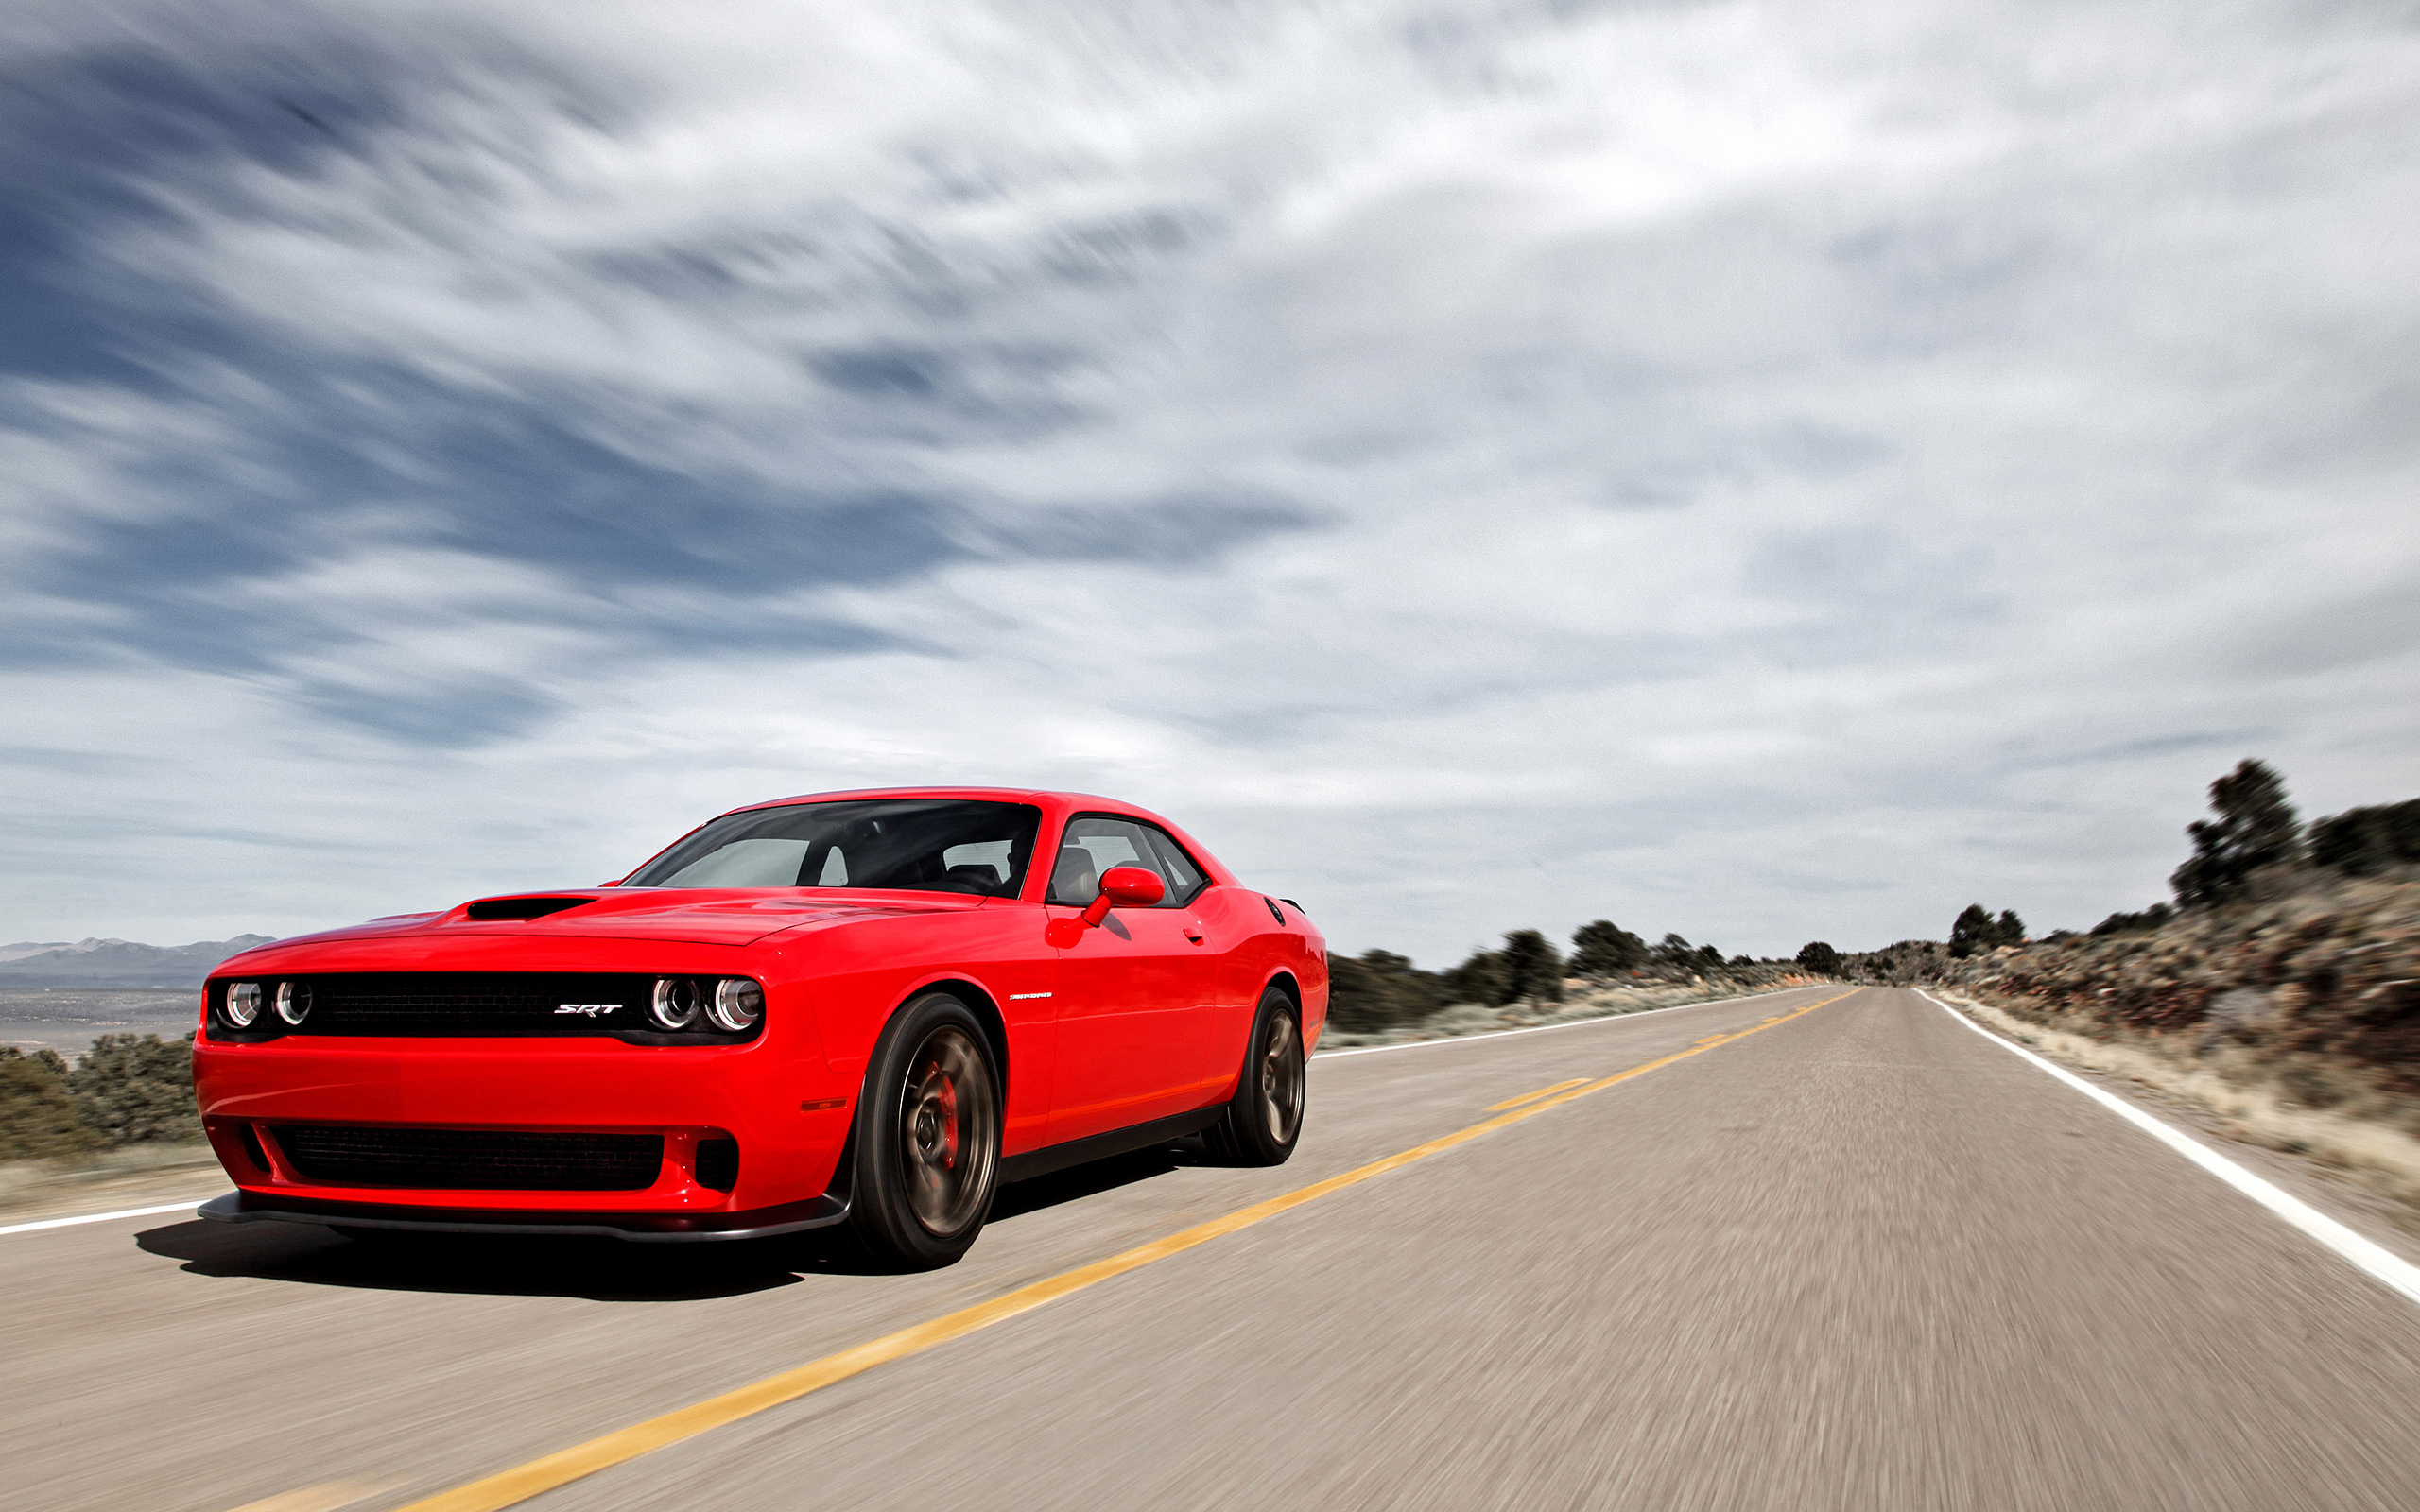 Dodge Challenger Srt Hd Wallpaper Background Image 2560x1600